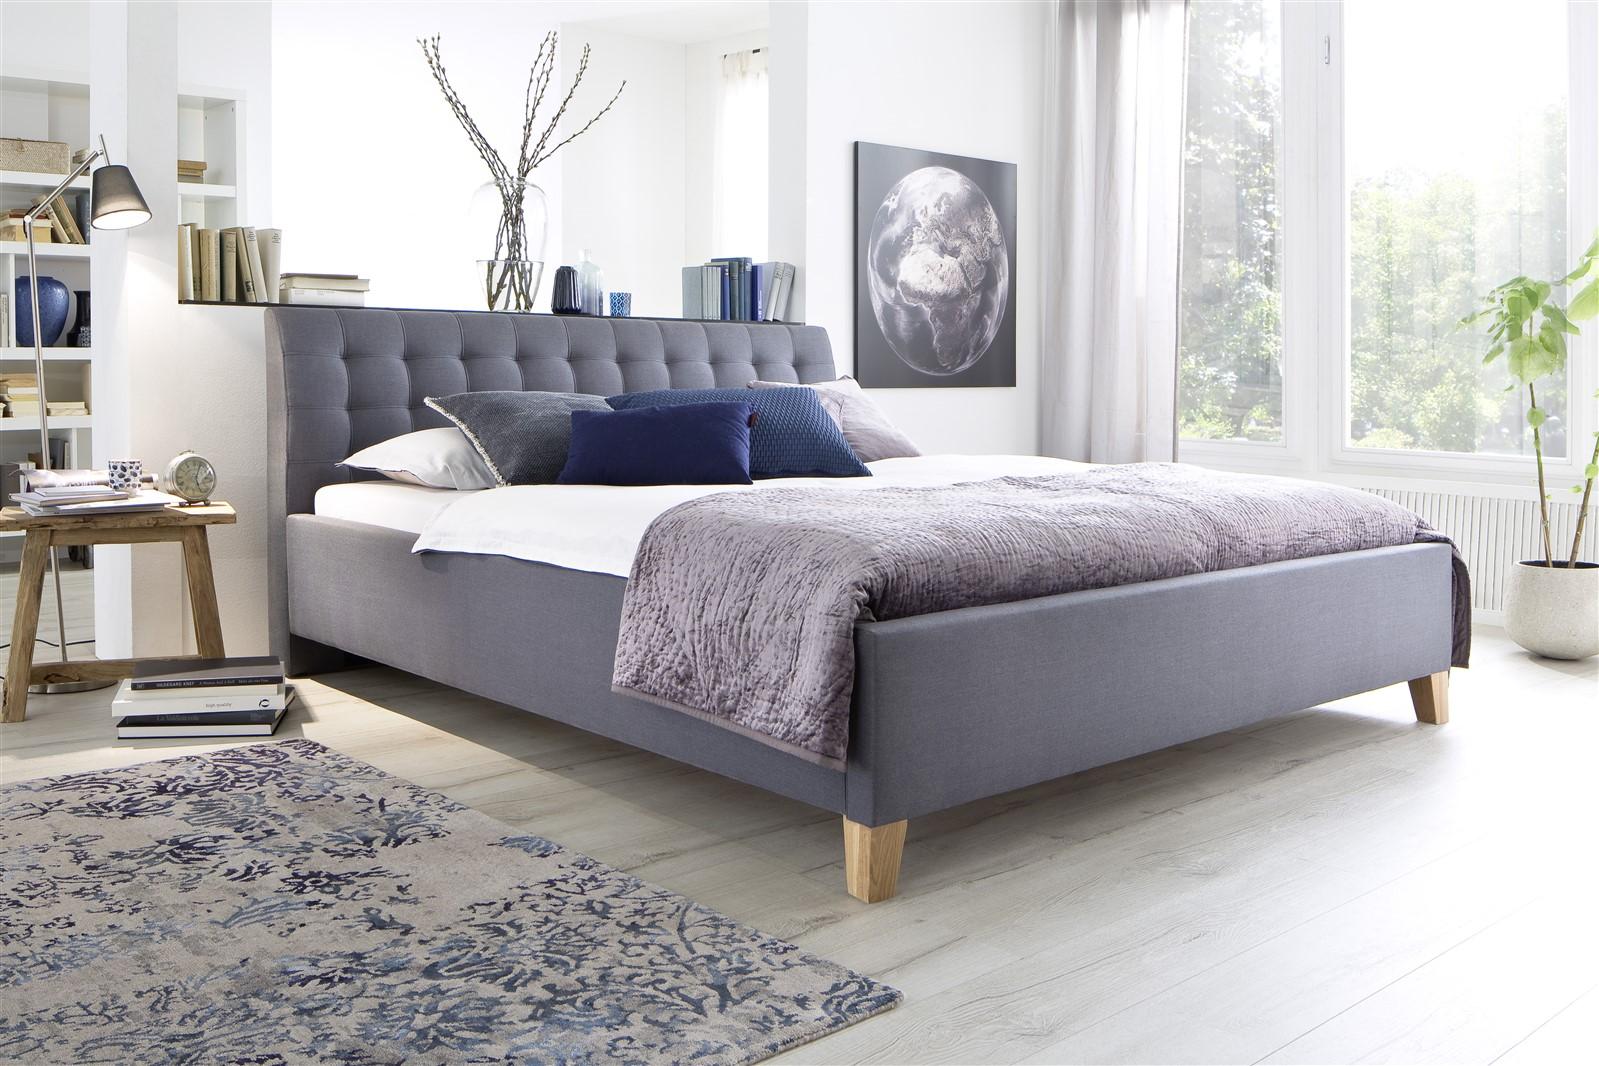 polsterbett bett doppelbett dennis 180x200 cm stoffbezug grau fun m bel. Black Bedroom Furniture Sets. Home Design Ideas